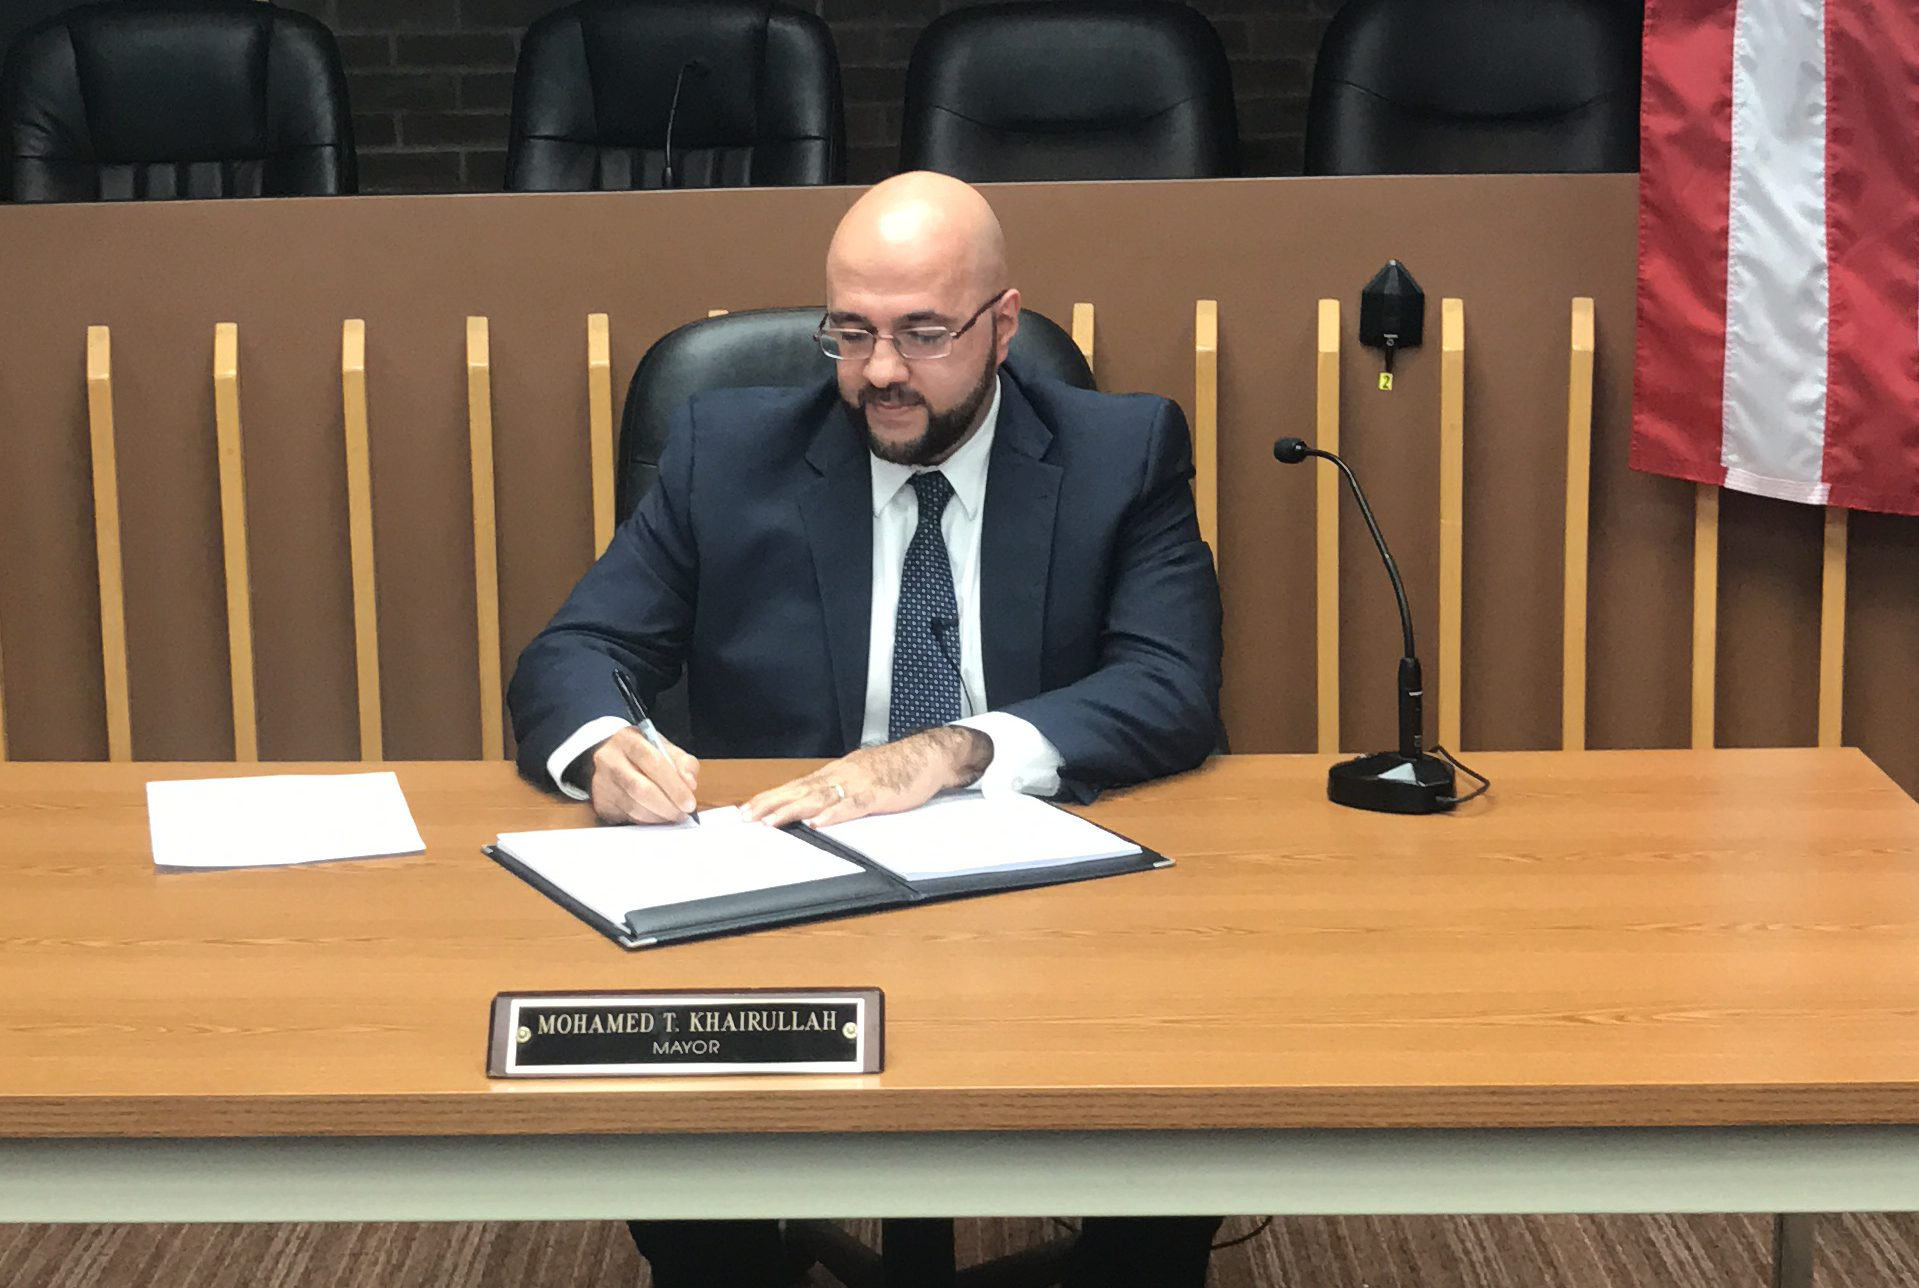 Mayor Khairullah signed Prospect Park's first executive order.